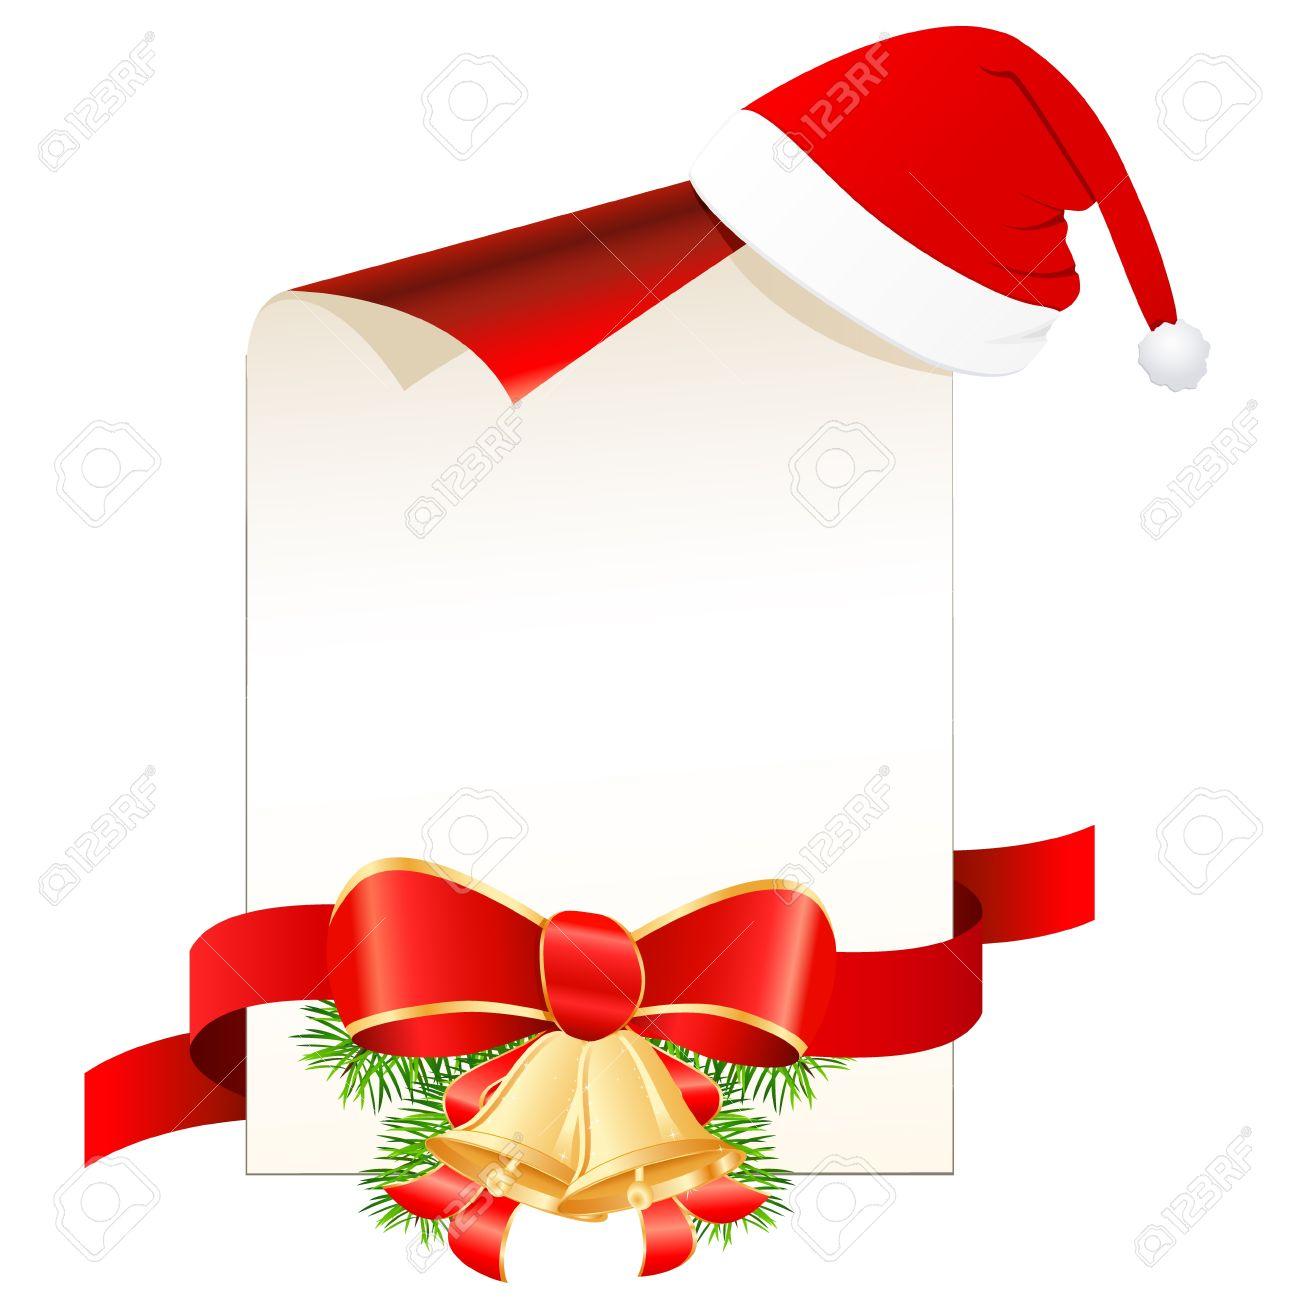 Christmas Wish List With Santa Hat Royalty Free Cliparts Vectors – Santa Wish Lists